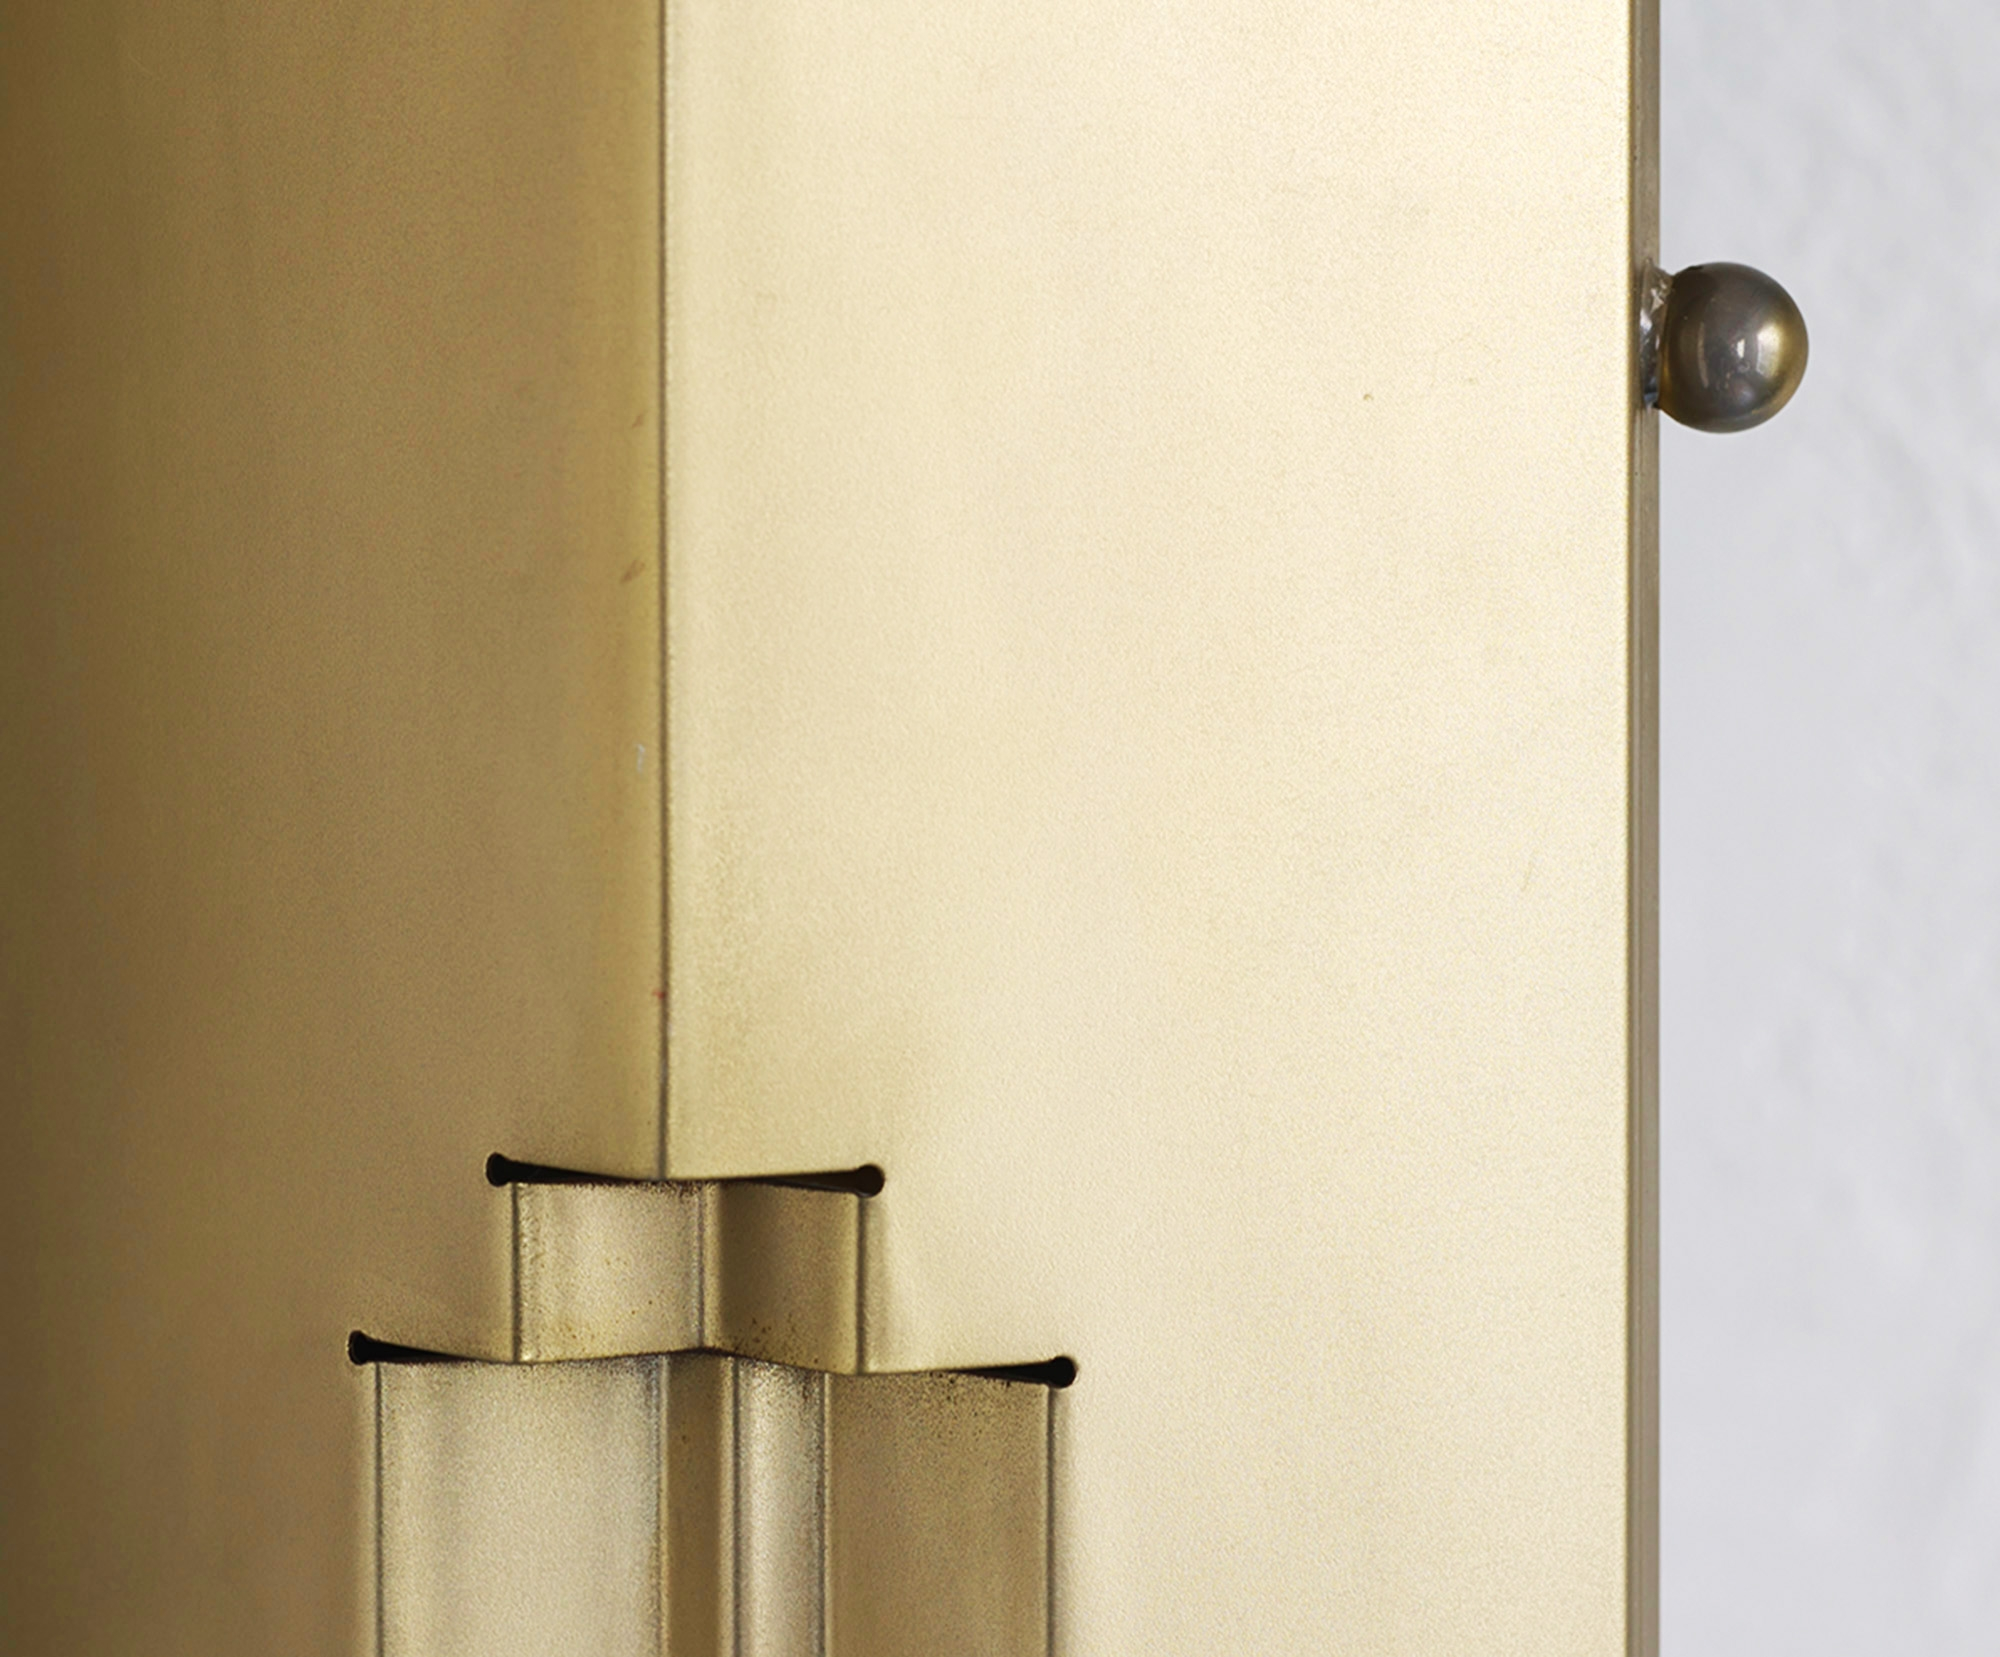 totem-floor-lamp-by-kazuhide-takahama-image-04